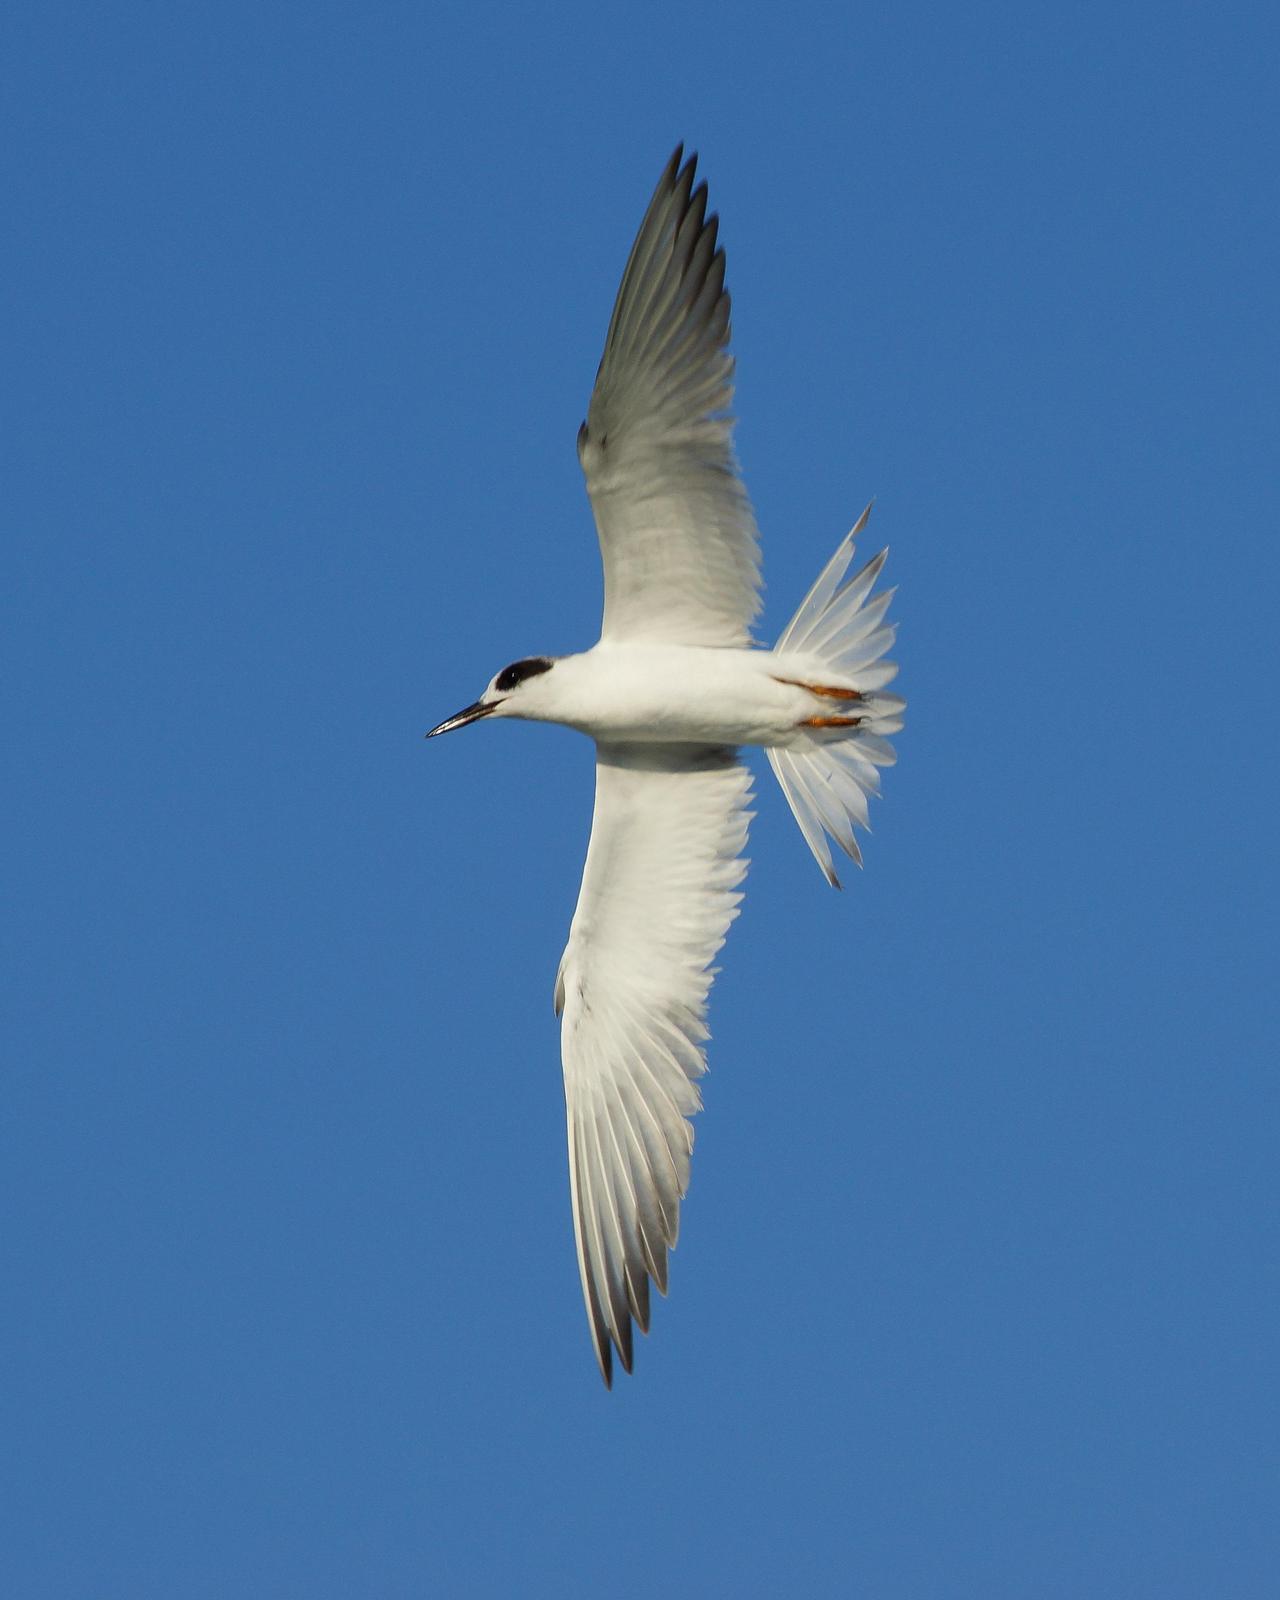 Forster's Tern Photo by Steve Percival